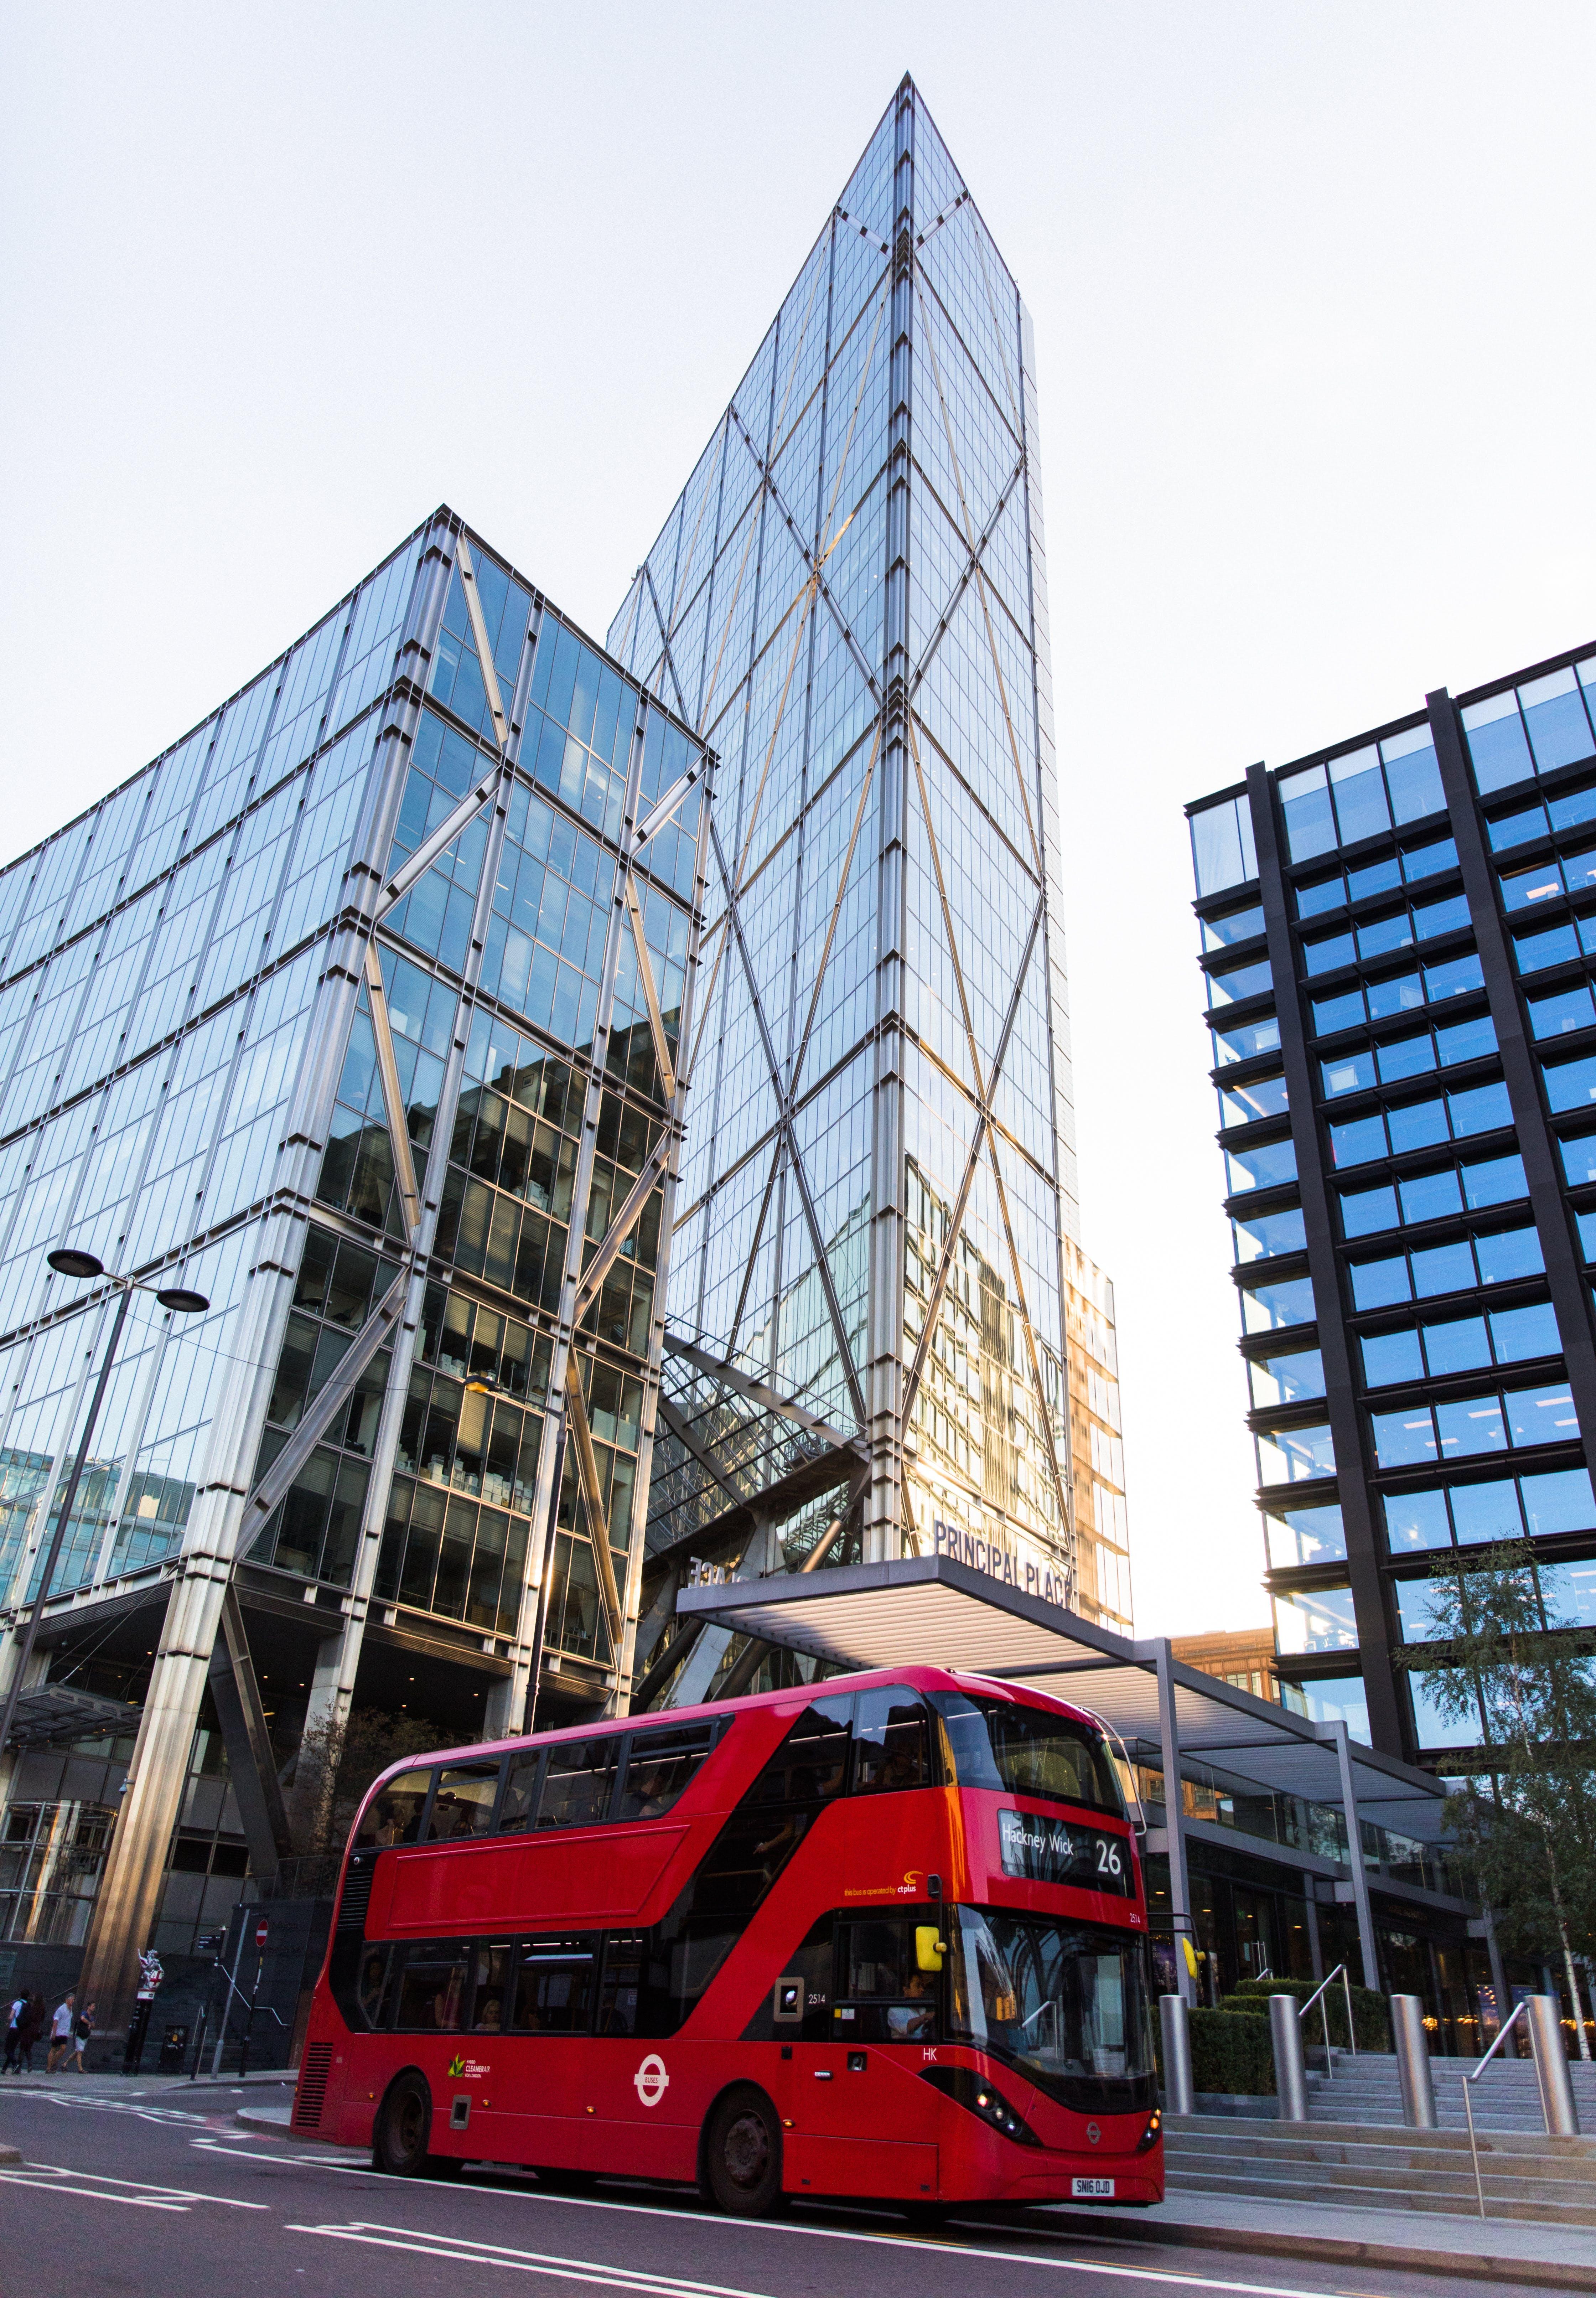 arquitectura, autobús de dos pisos, carrer